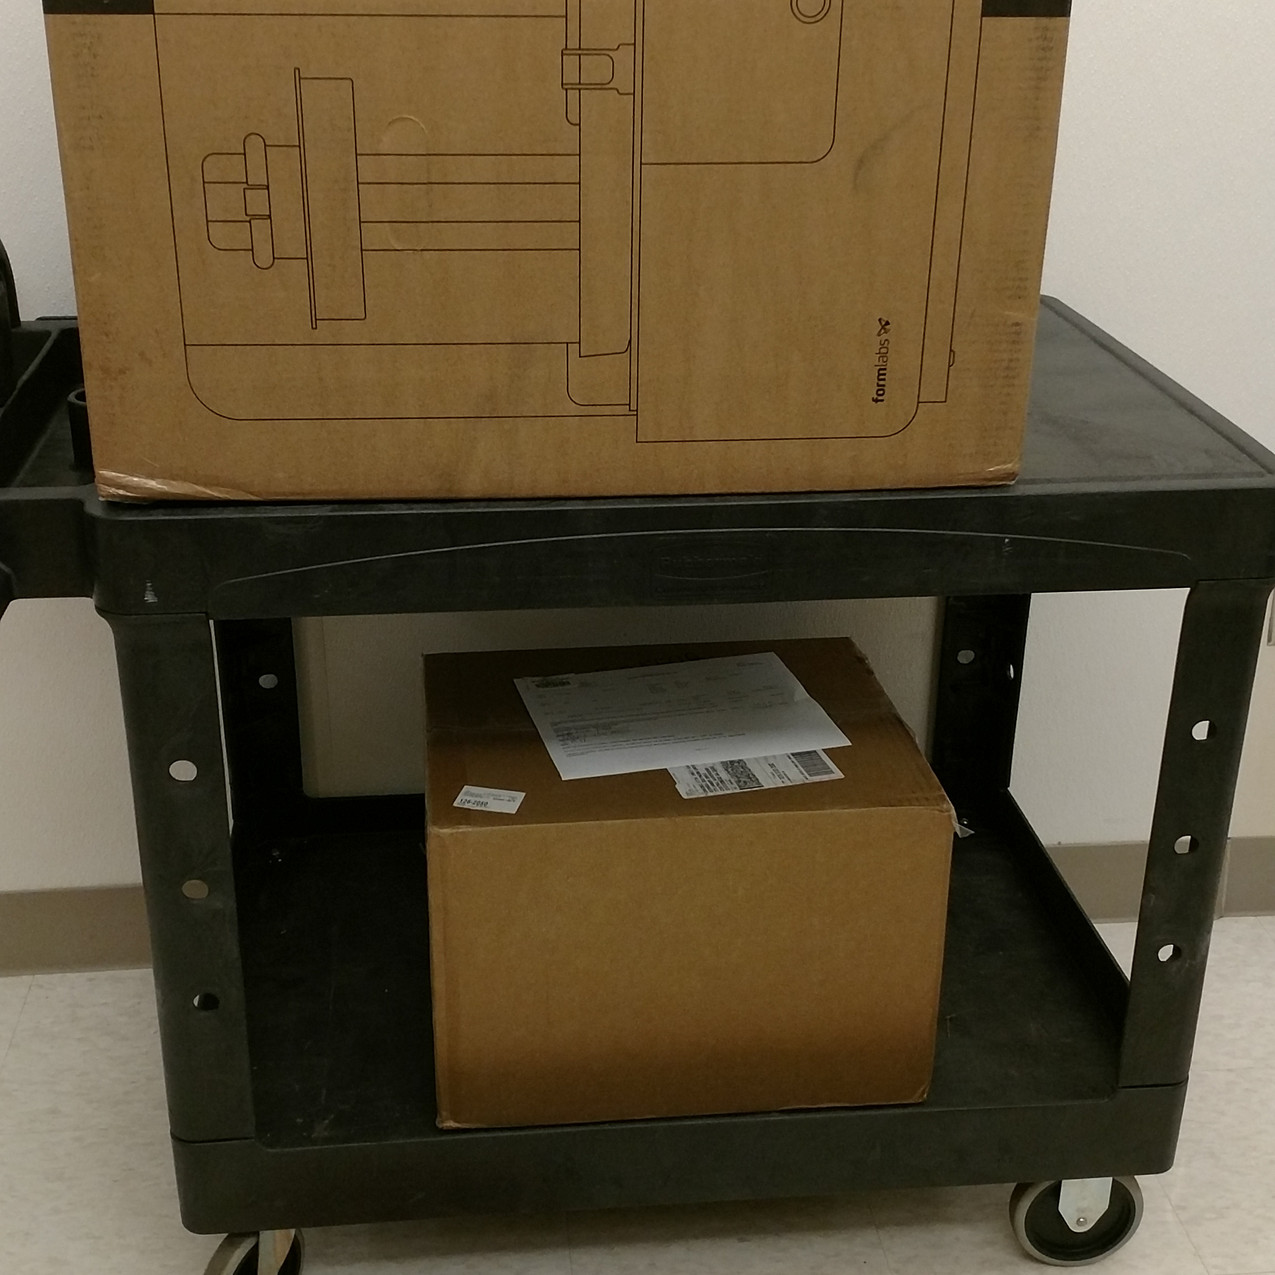 3D printer in the box